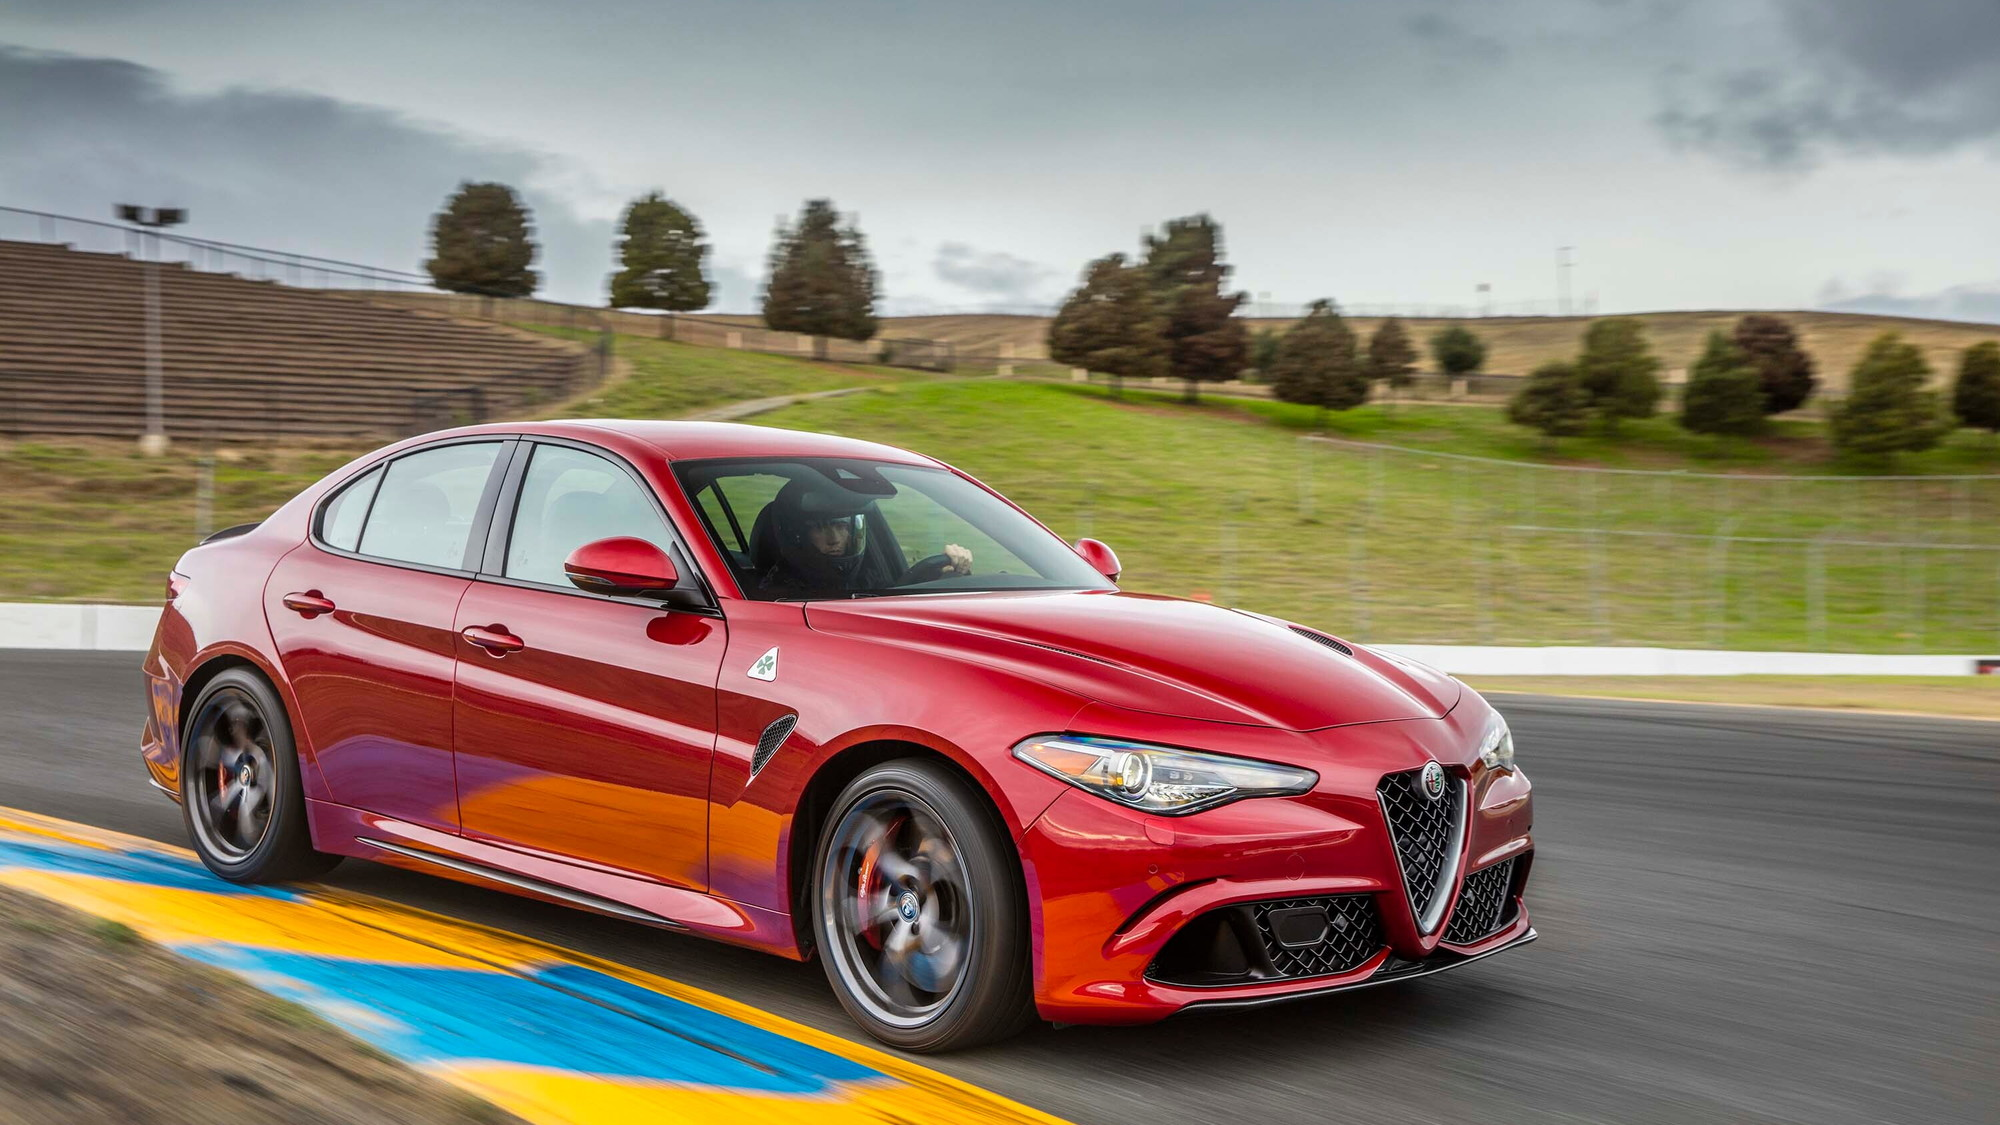 Maserati To Add Alfieri Halo Car New Suv Electric Powertrain From